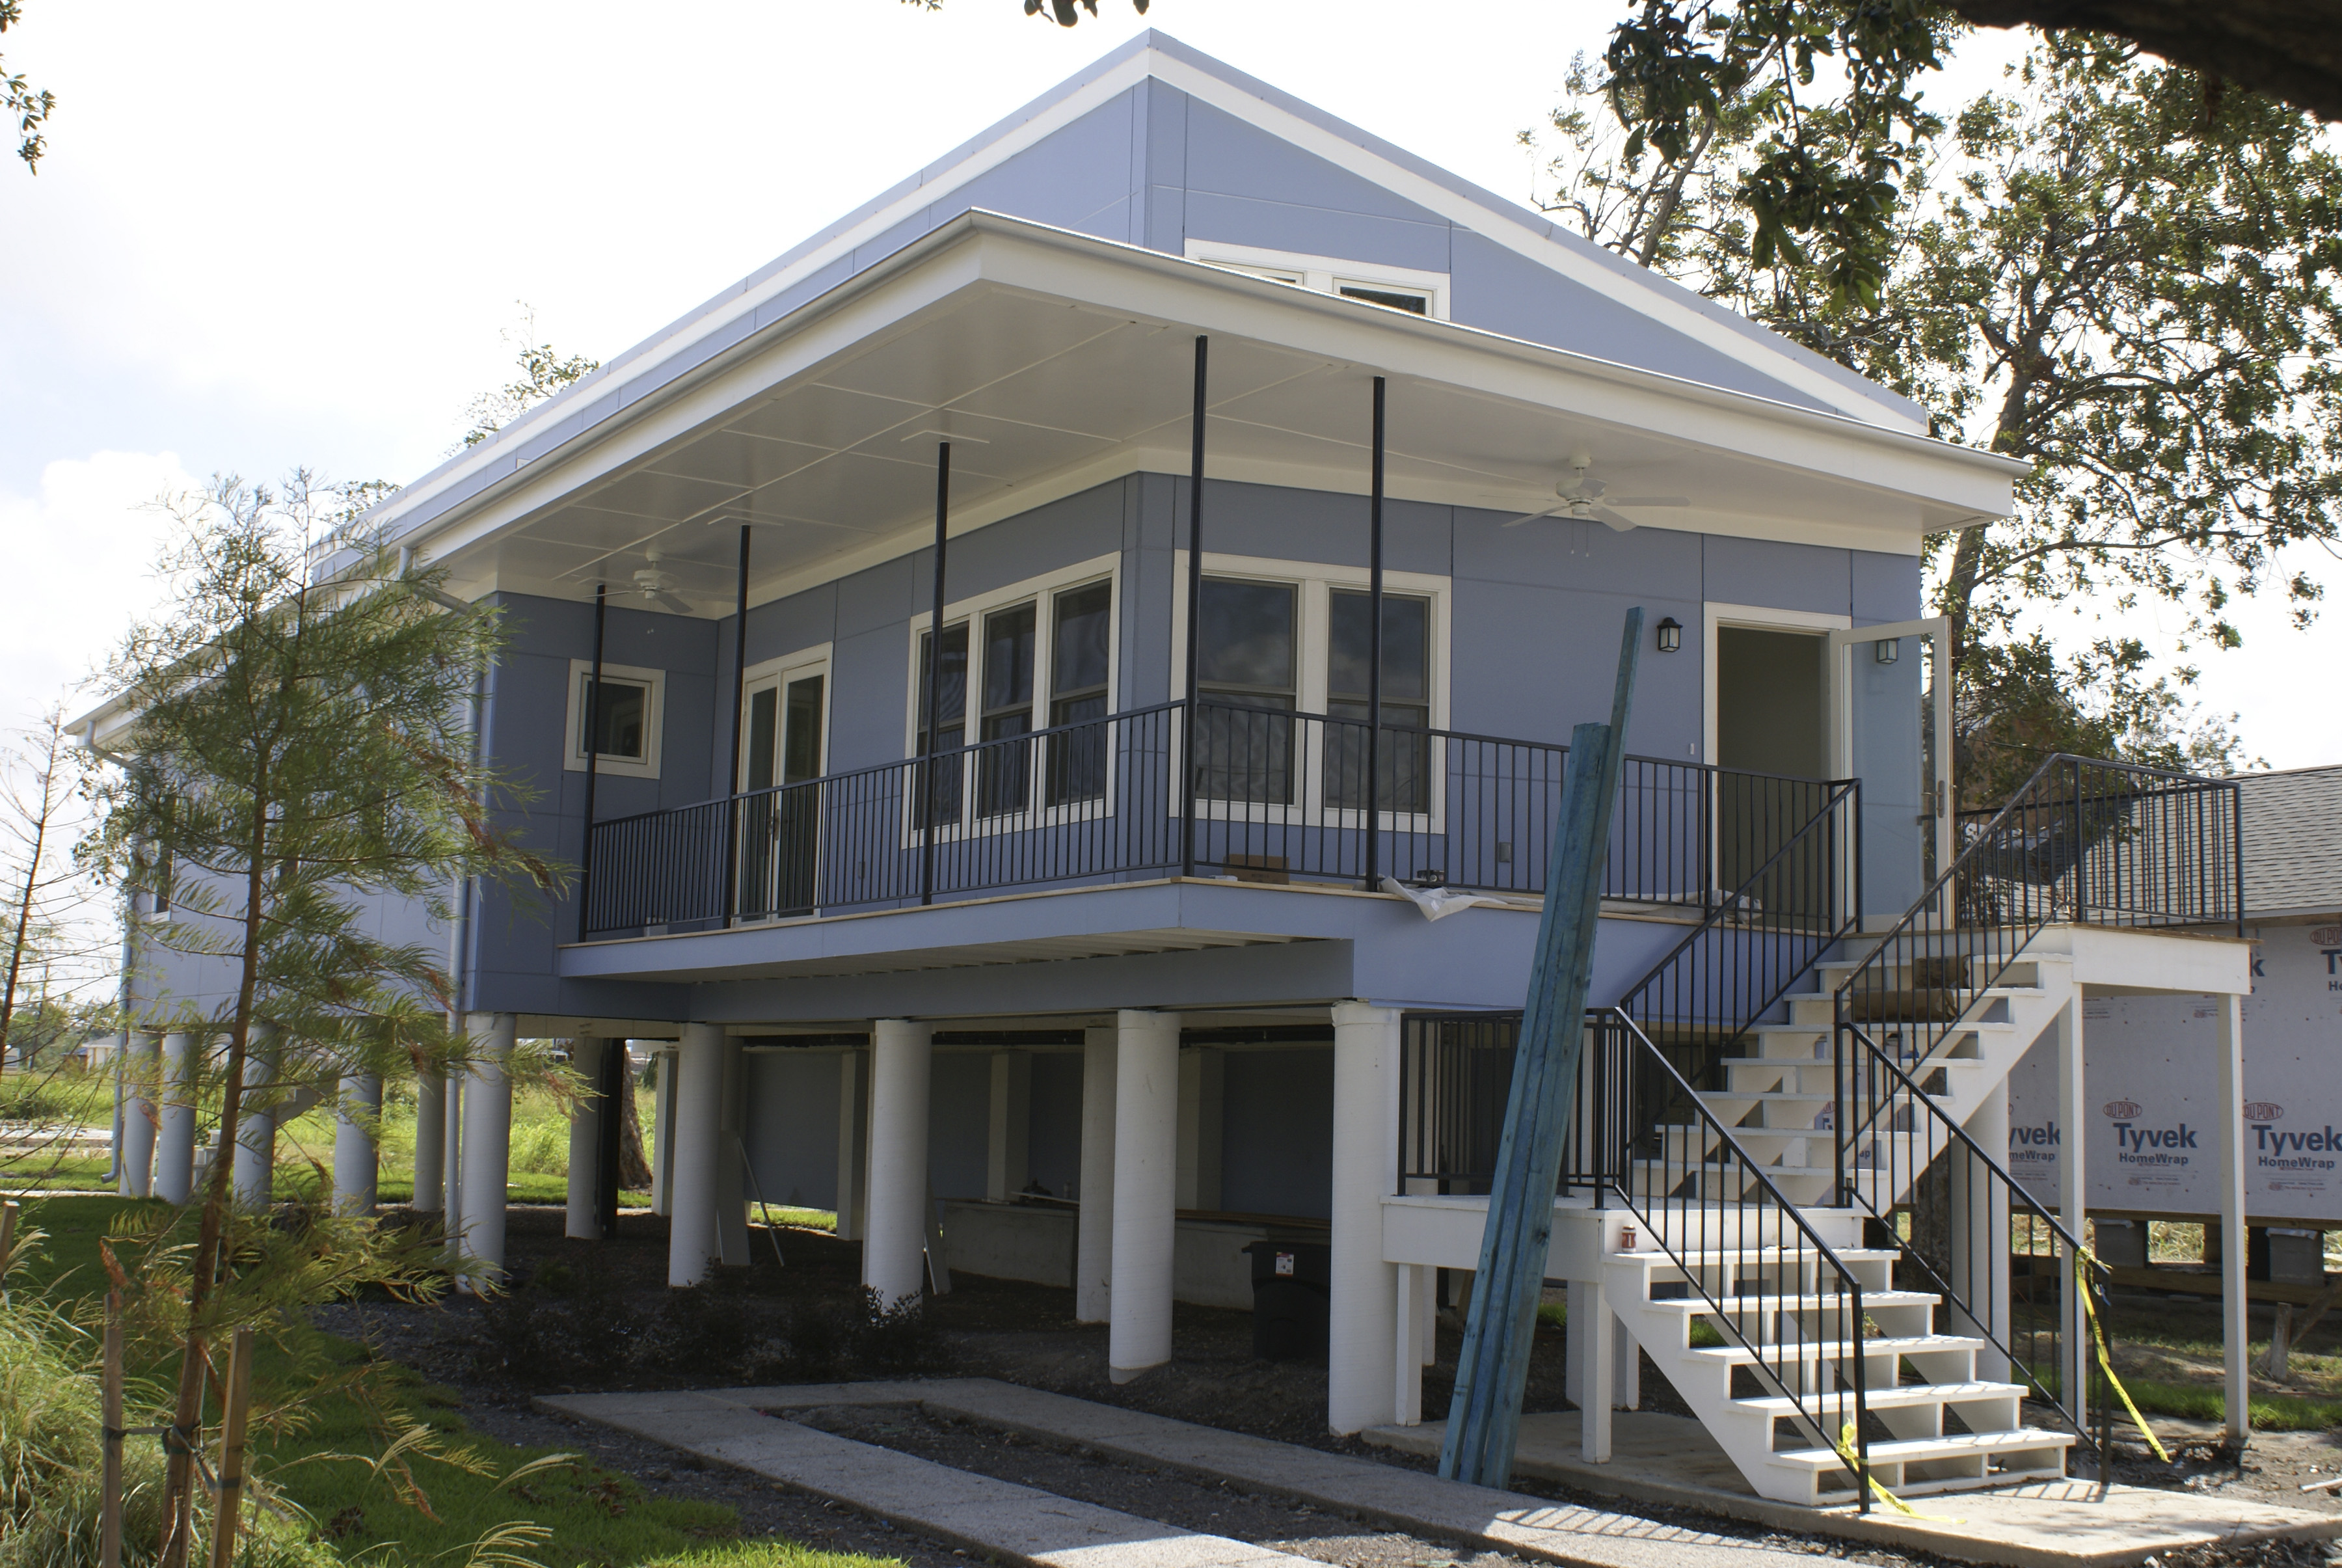 Rotting wood product in post katrina built homes may spark for Katrina home